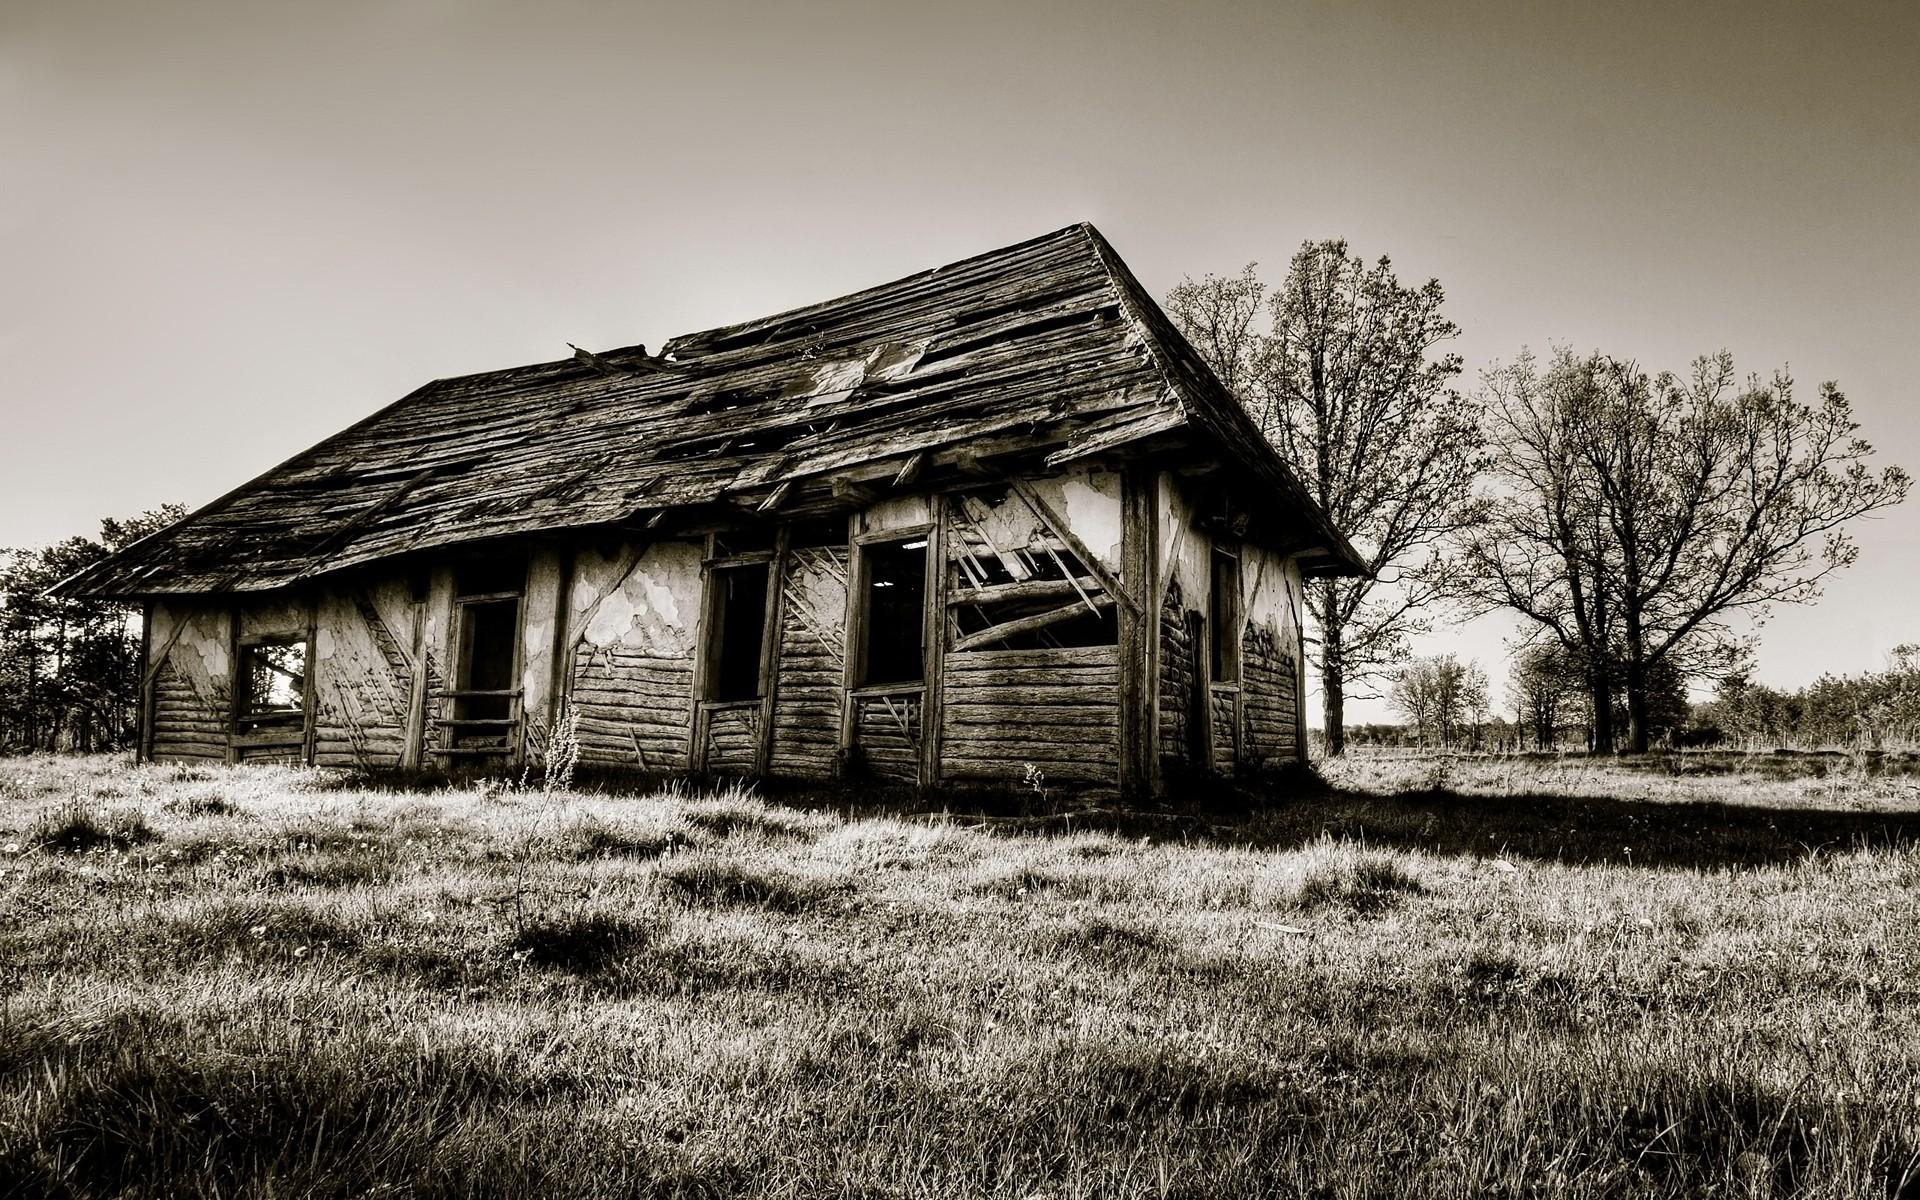 Fond d 39 cran monochrome b timent hiver la for Agrandissement maison zone rurale